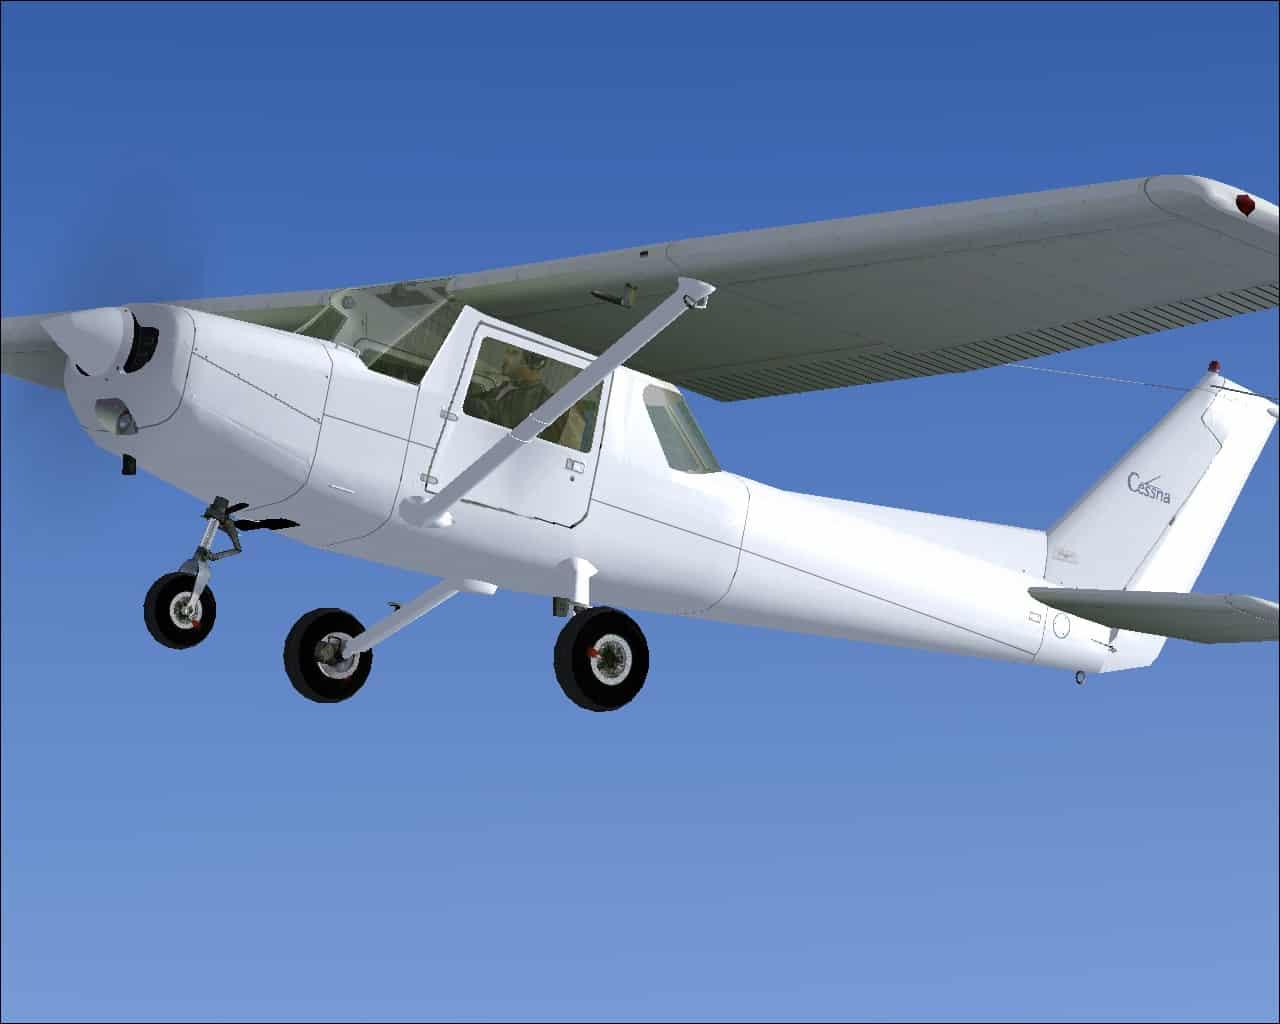 FSX Cessna 152 Blank White Texture - Flight Simulator Addon / Mod